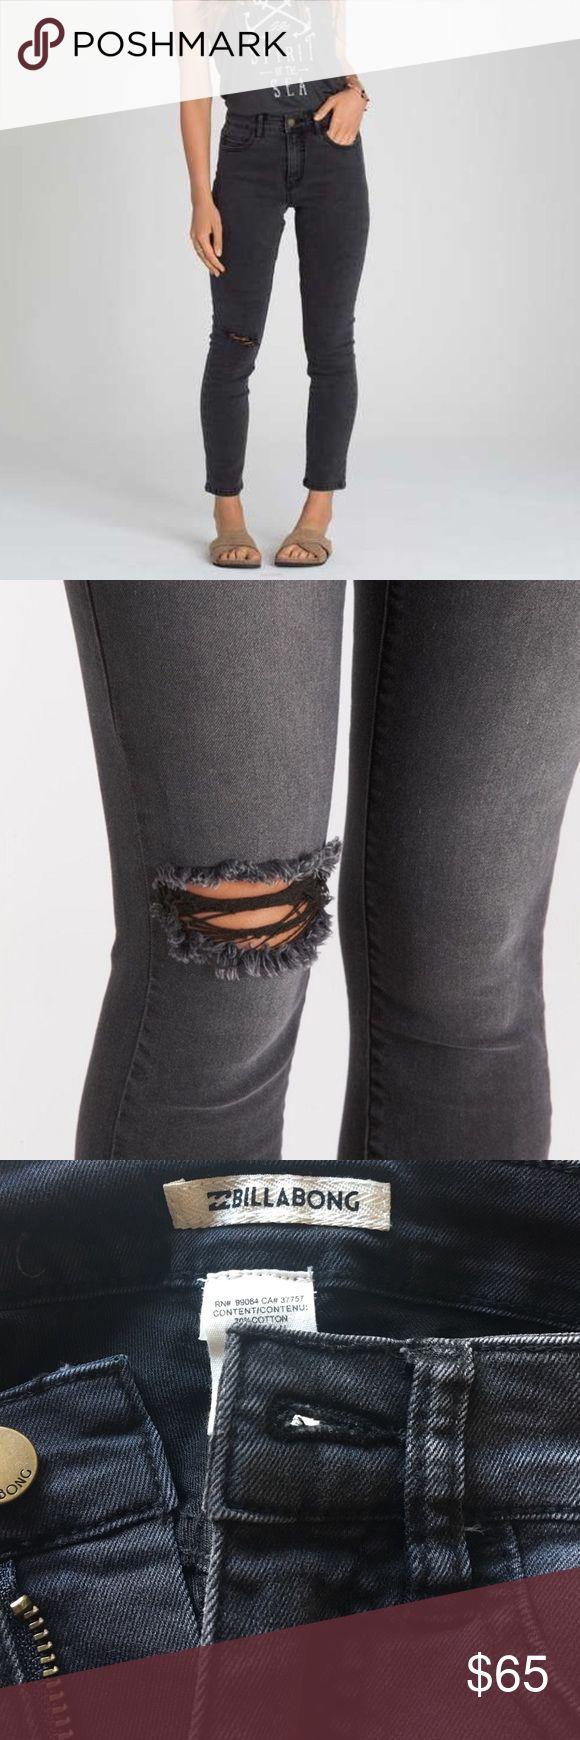 Billabong-HOT MAMA SKINNY DENIM NWT! Distressed skinny jeans! Billabong Jeans Skinny